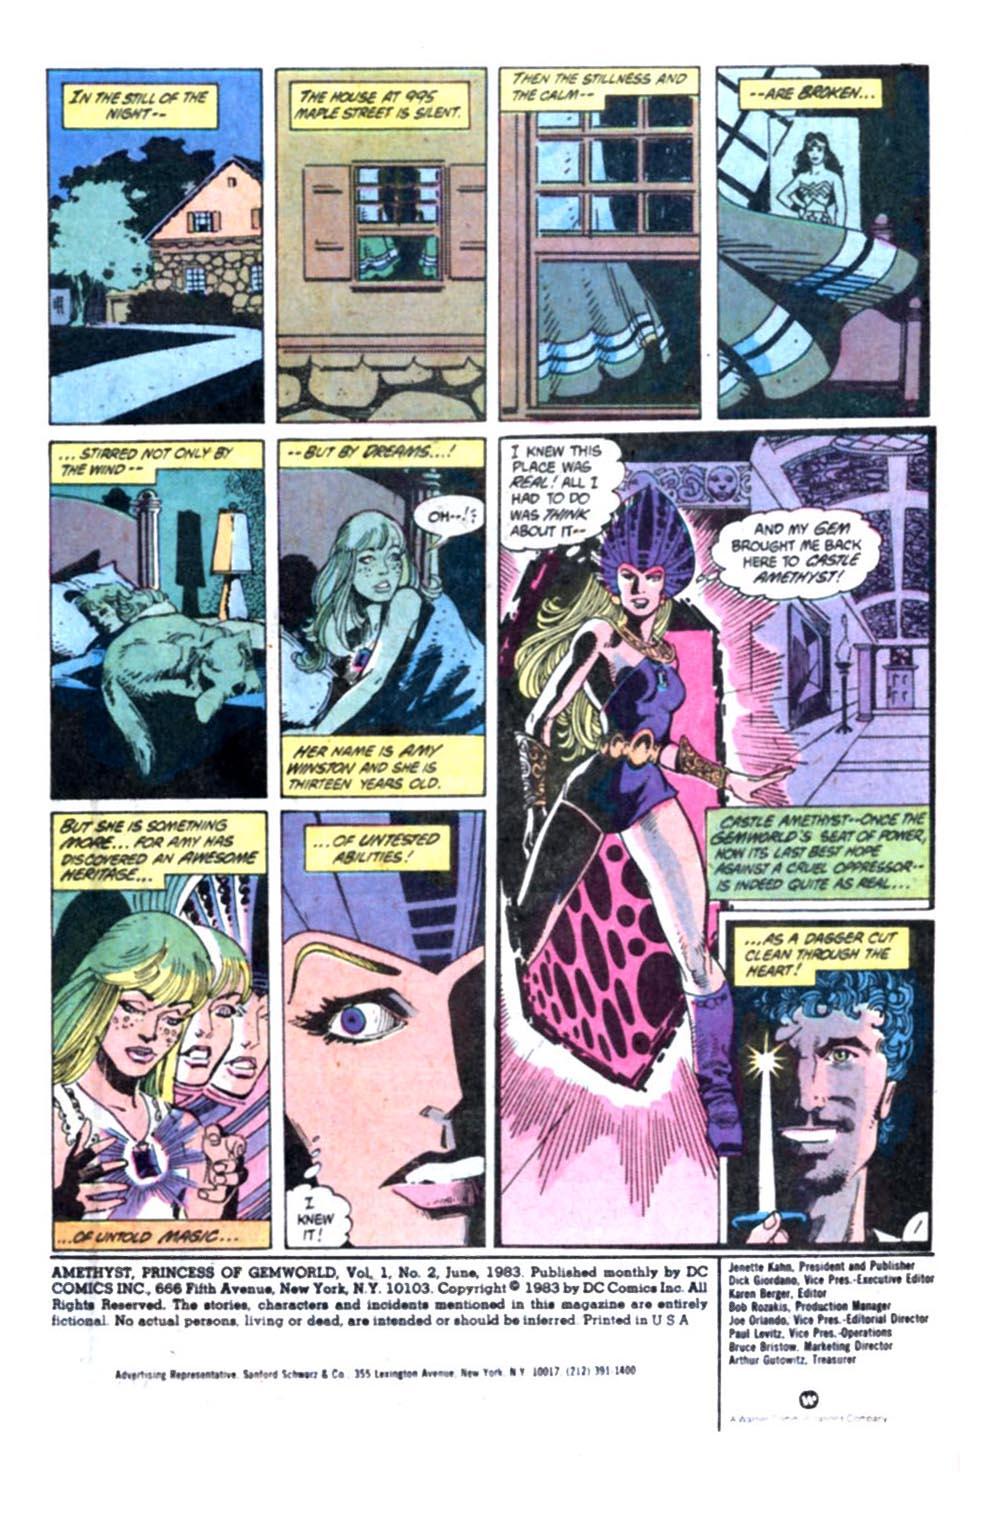 Read online Amethyst, Princess of Gemworld comic -  Issue #2 - 2